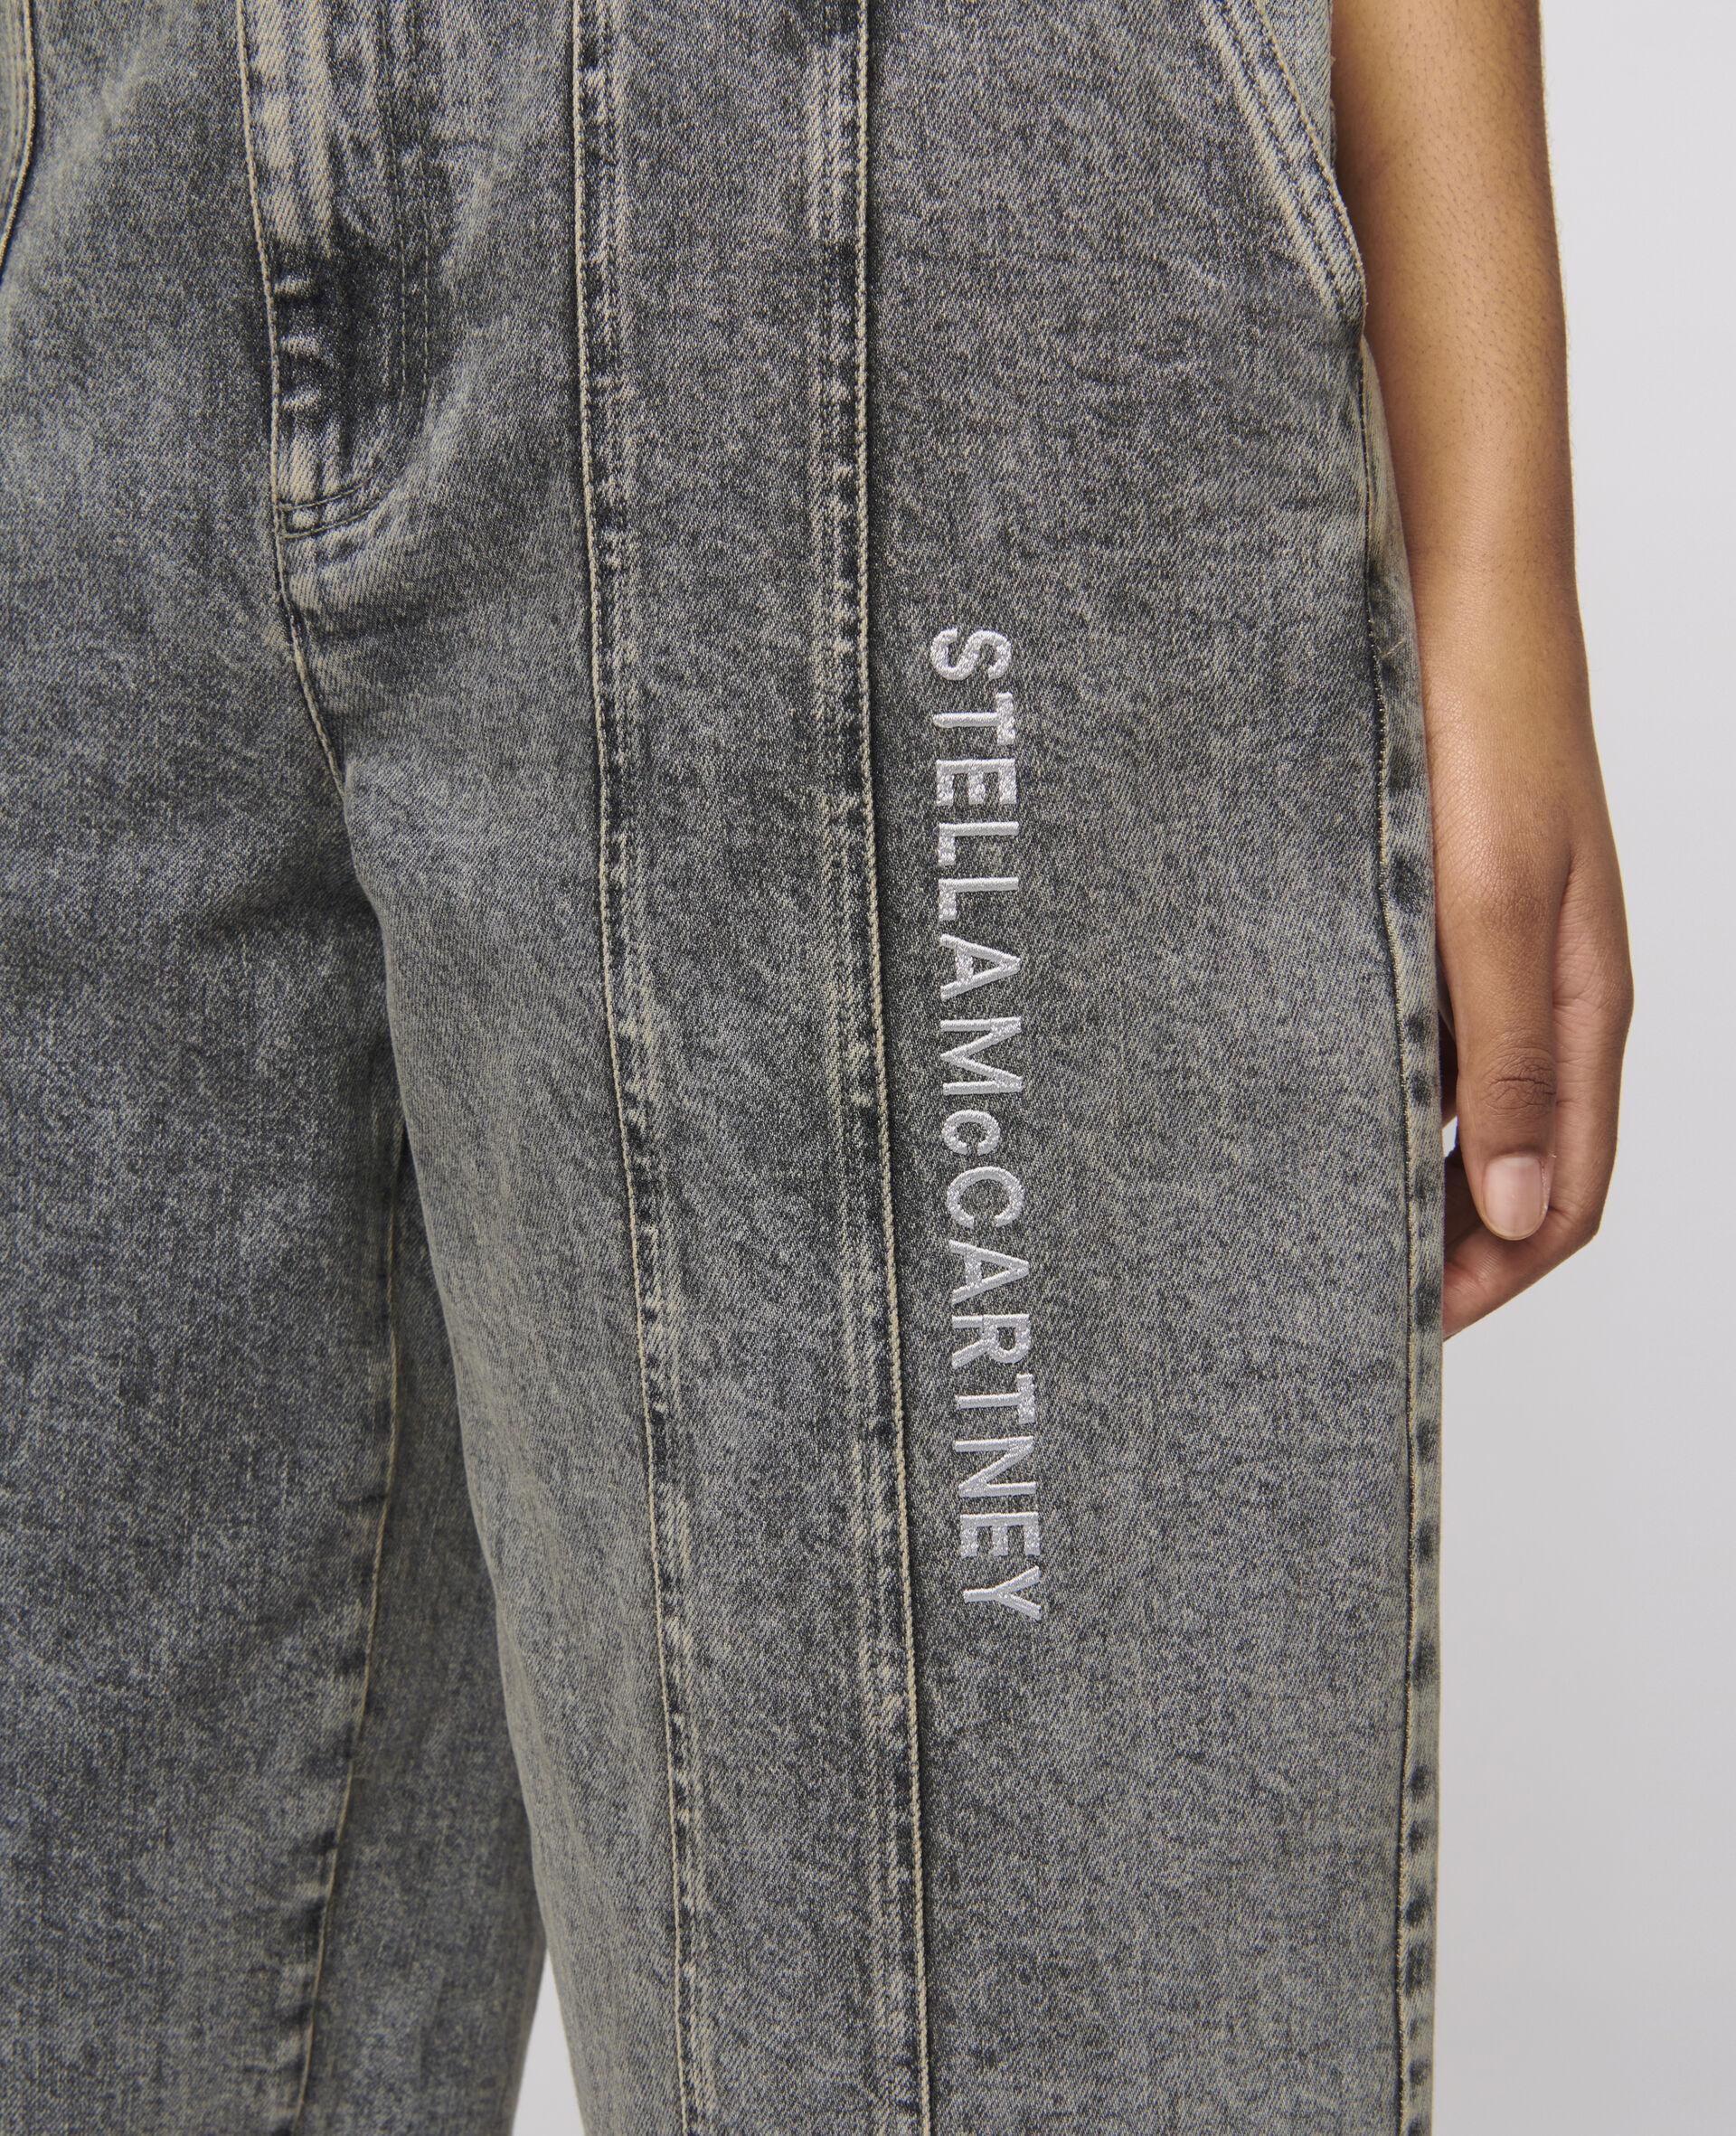 Logo Embroidered Jeans -Grey-large image number 3